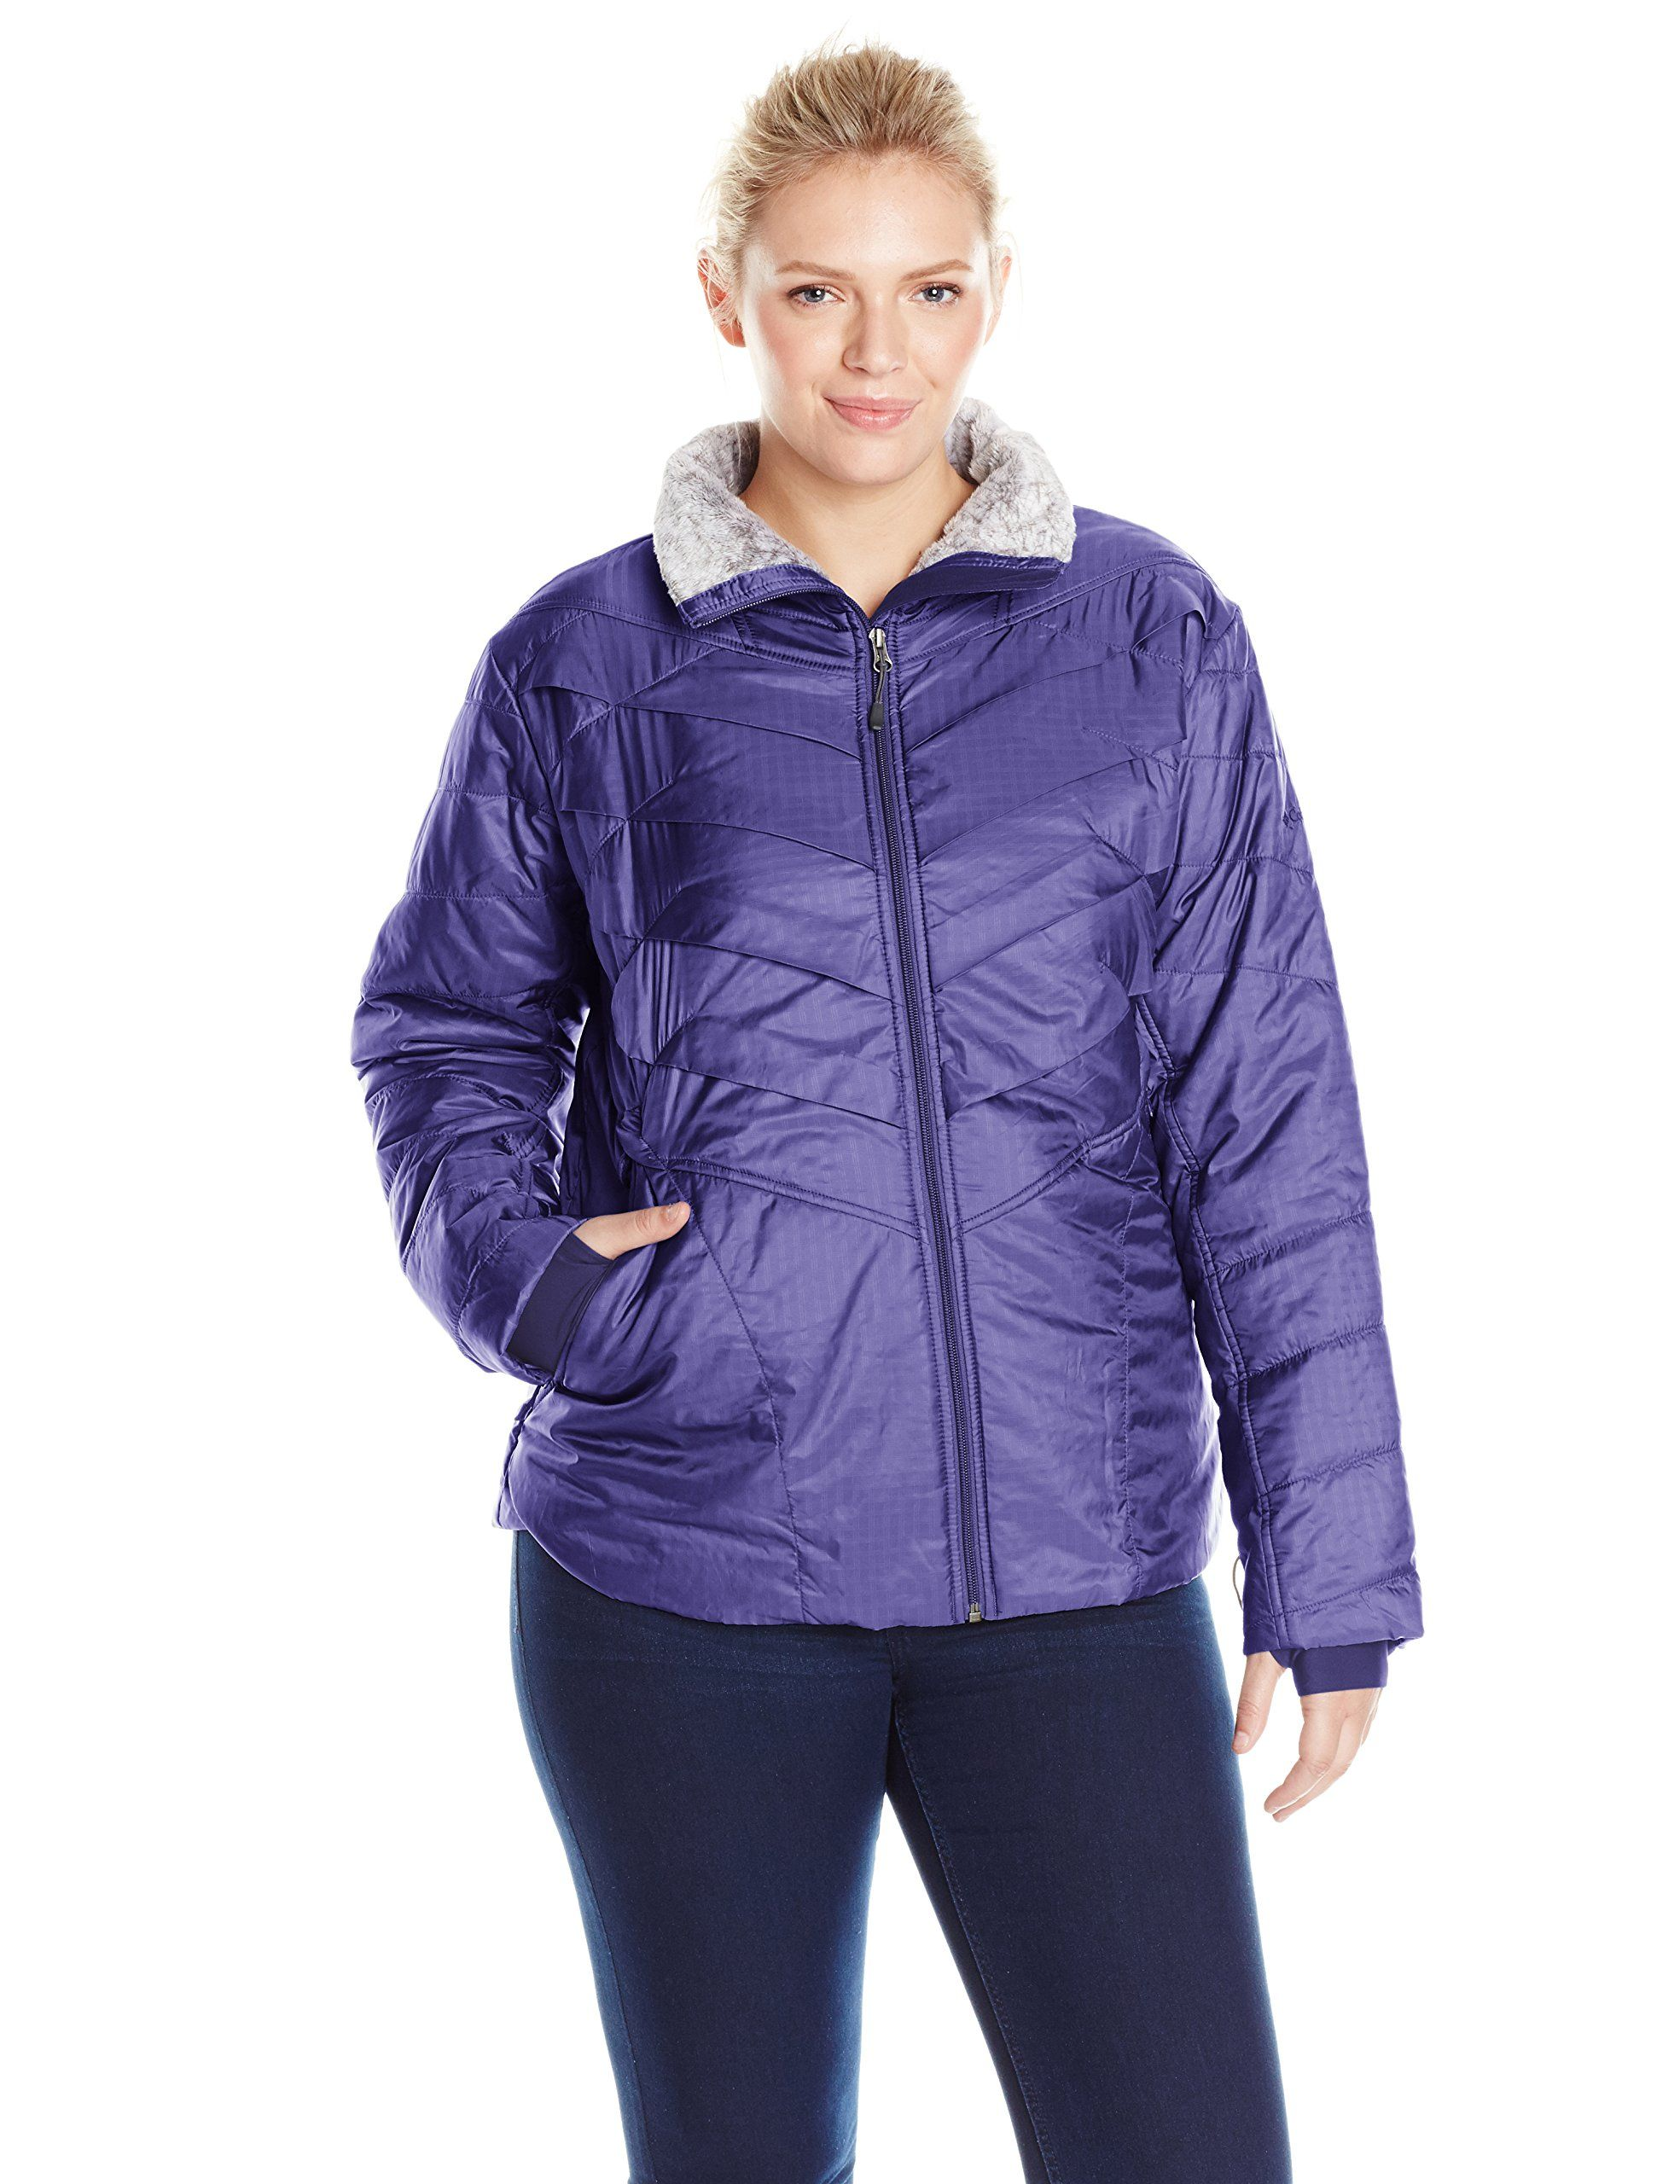 Columbia Women S Plus Size Kaleidaslope Ii Jacket Nightshade 3x Omni Heat Thermal Reflective And In Coats Jackets Women Sportswear Women Columbia Sportswear [ 2560 x 1969 Pixel ]